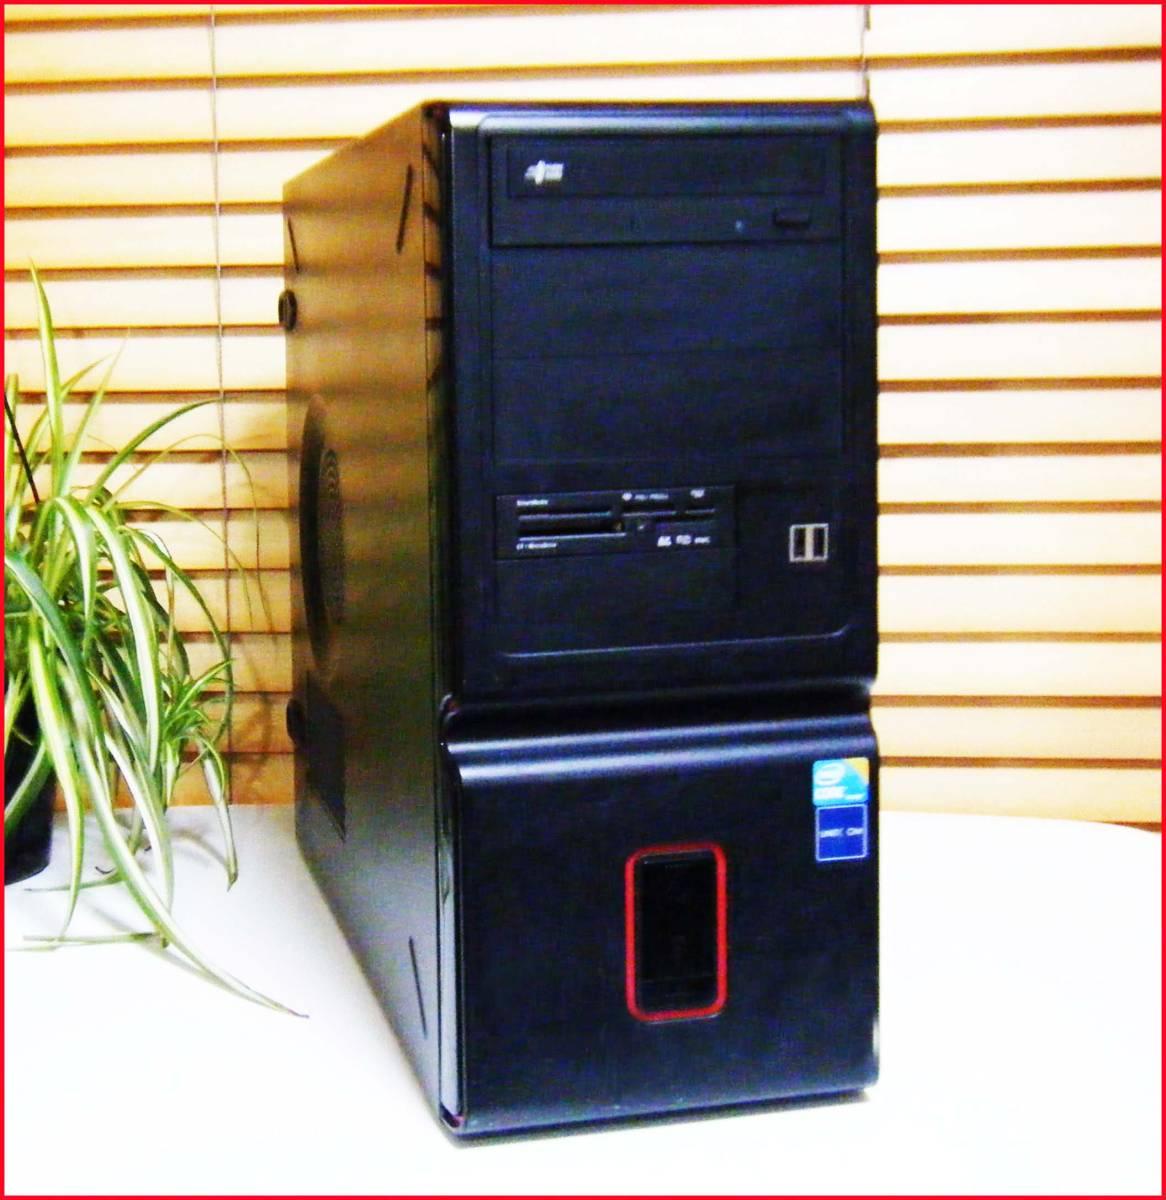 ◆ 秒速/i7 920/自作PMSI X58 ProE/新品SSD 160GB/HDD 1TB/Office2016/Win10Pro ◆_画像9